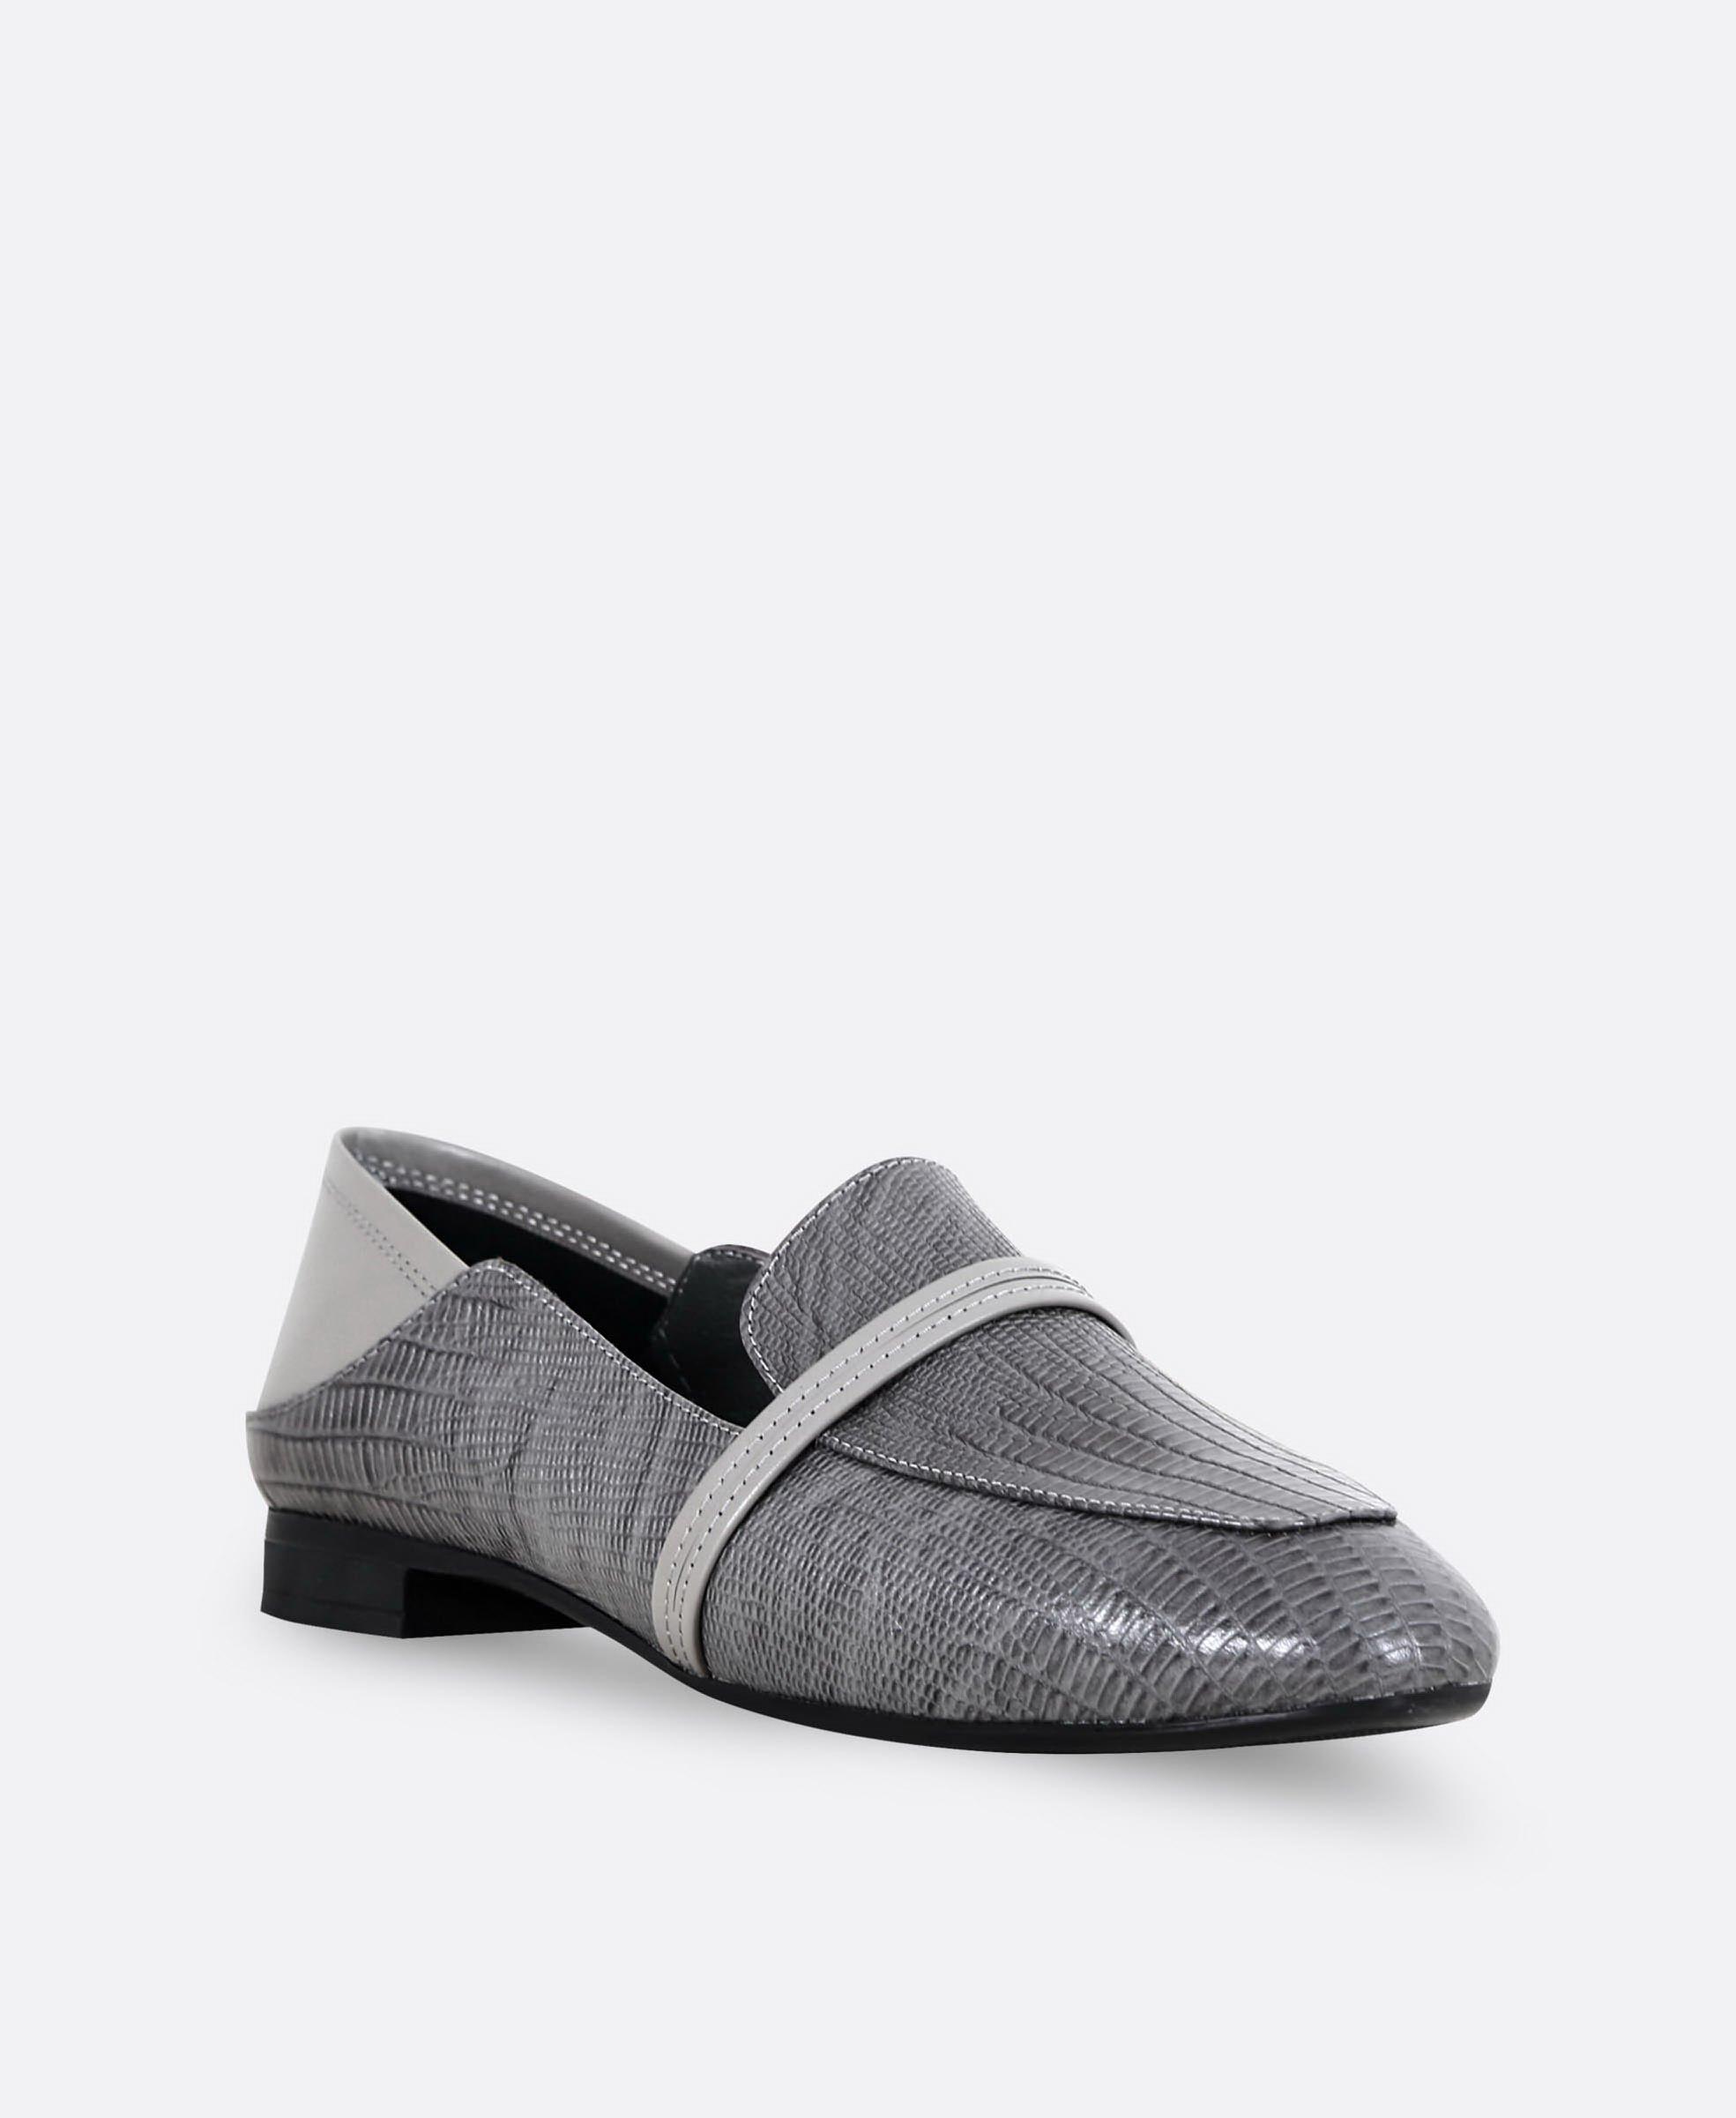 کفش زنانه چرم 0722